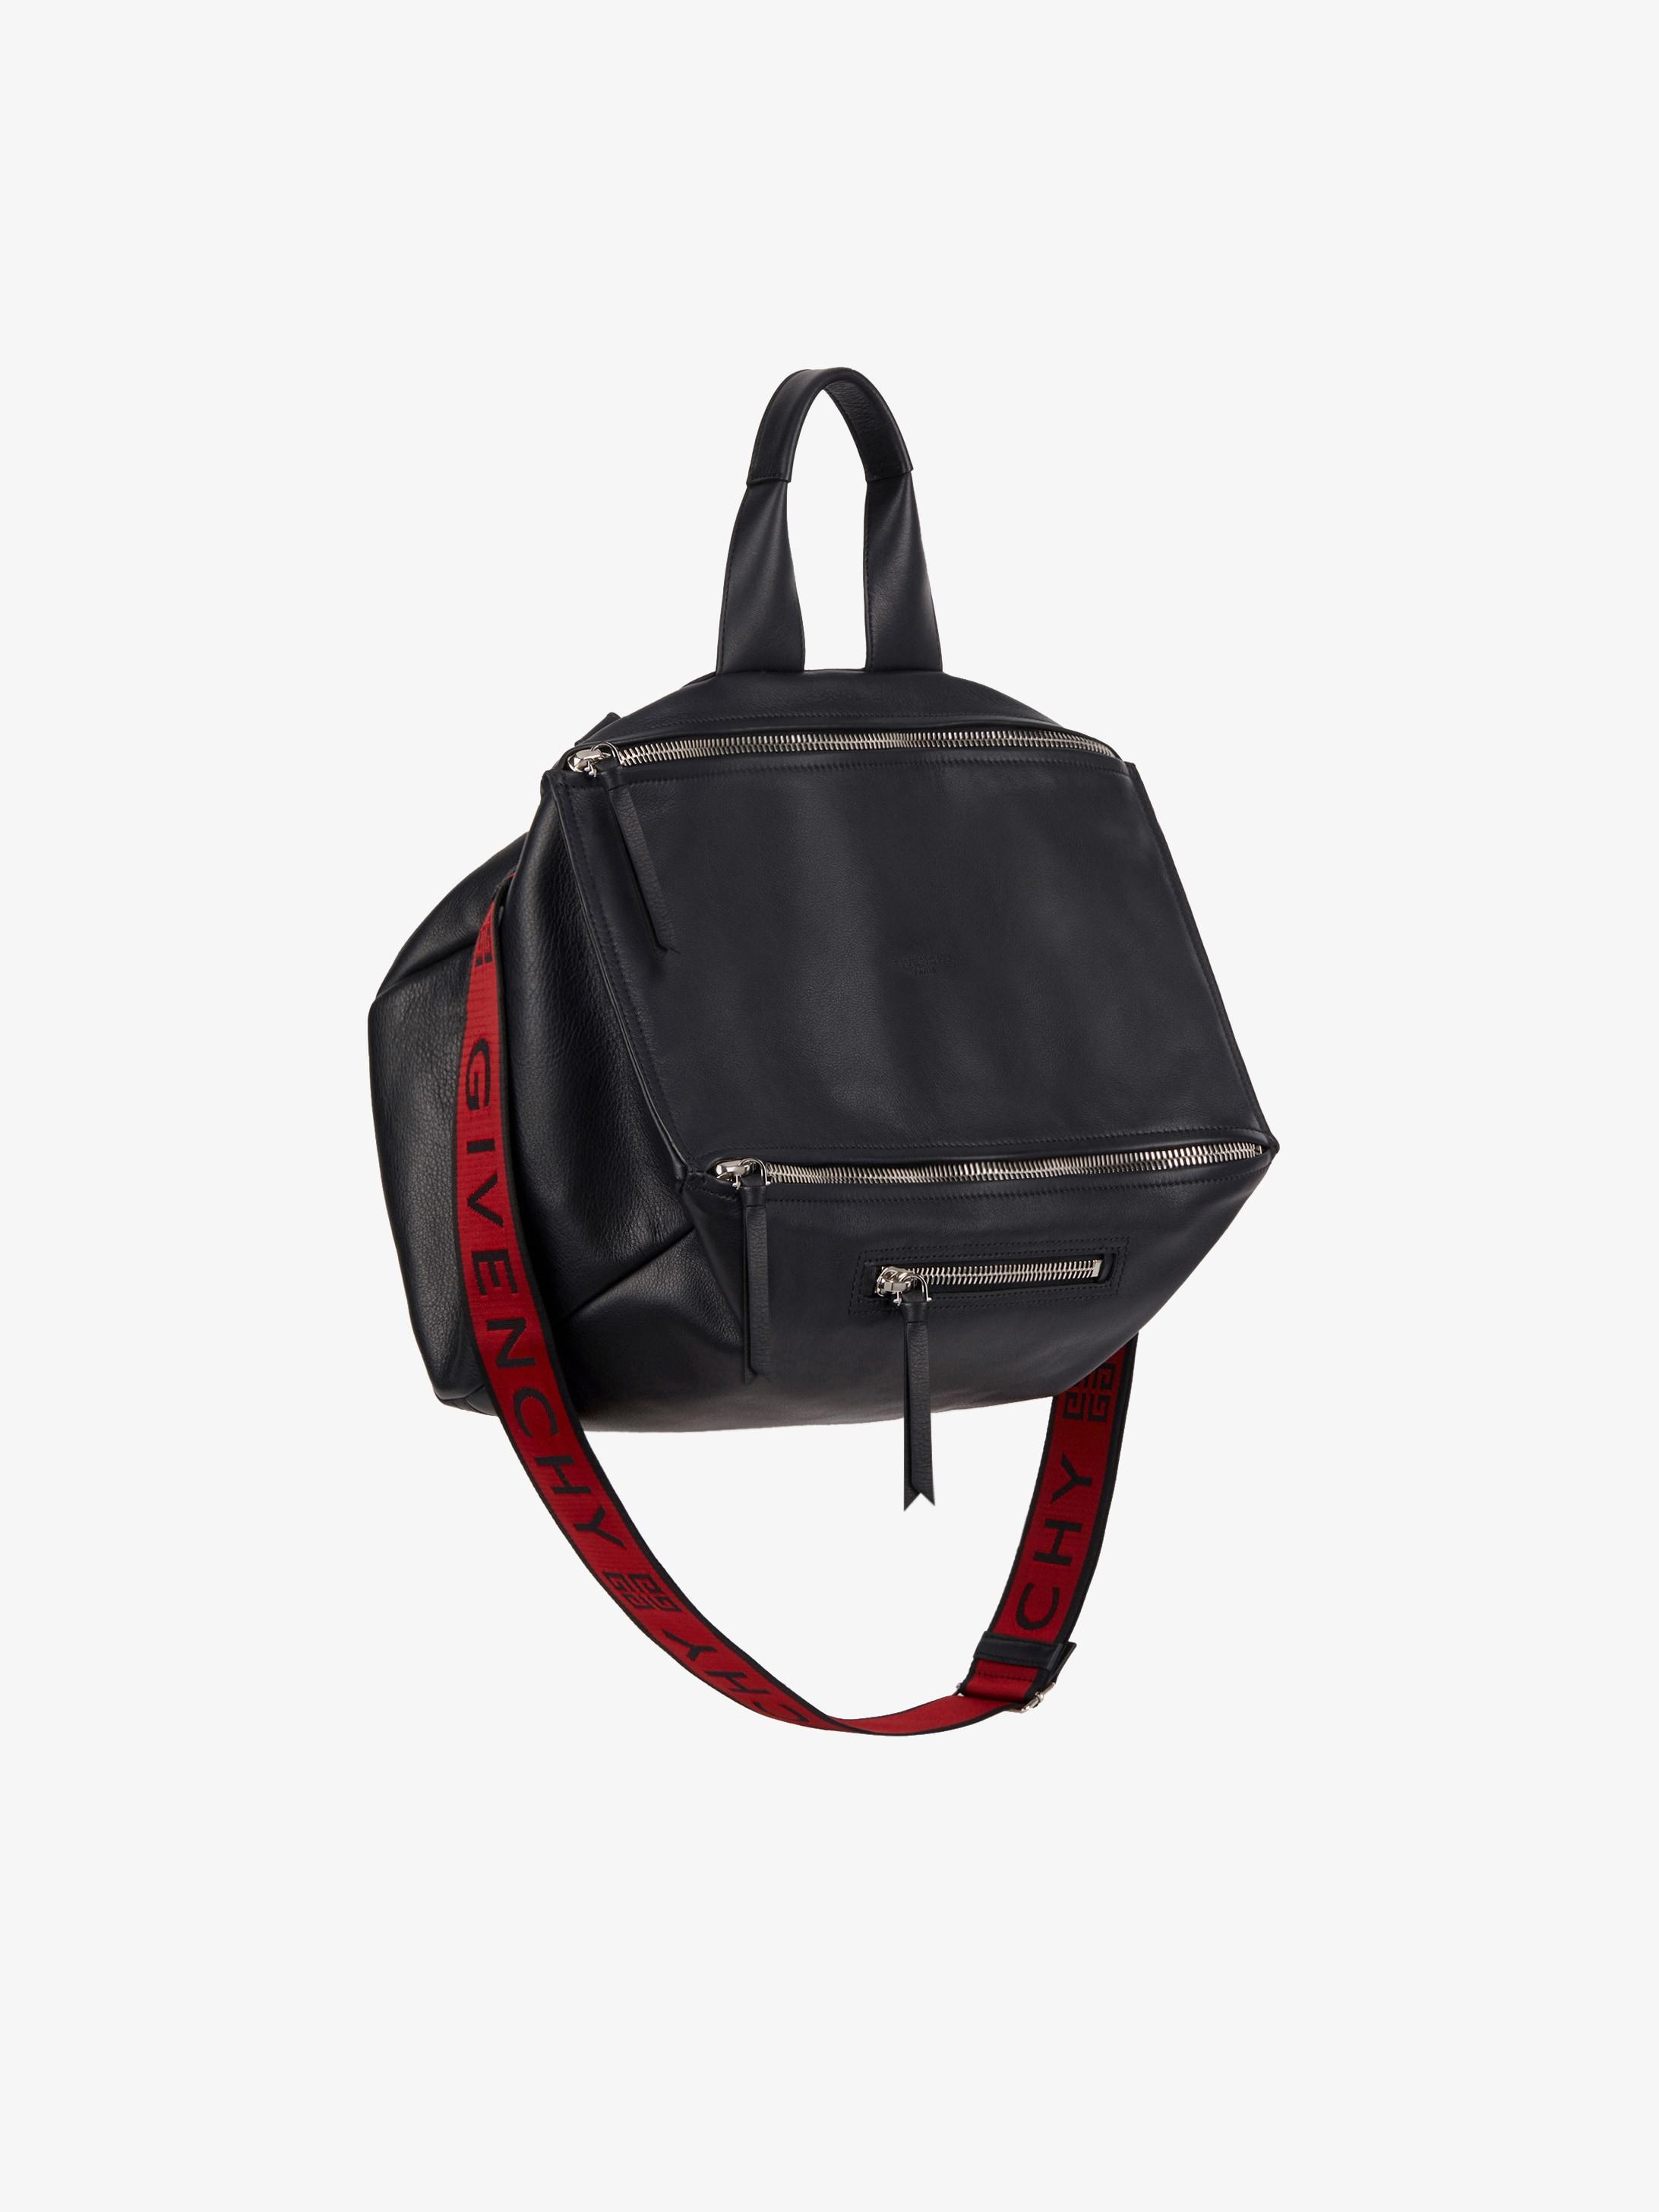 GIVENCHY 4G Pandora messenger bag in leather